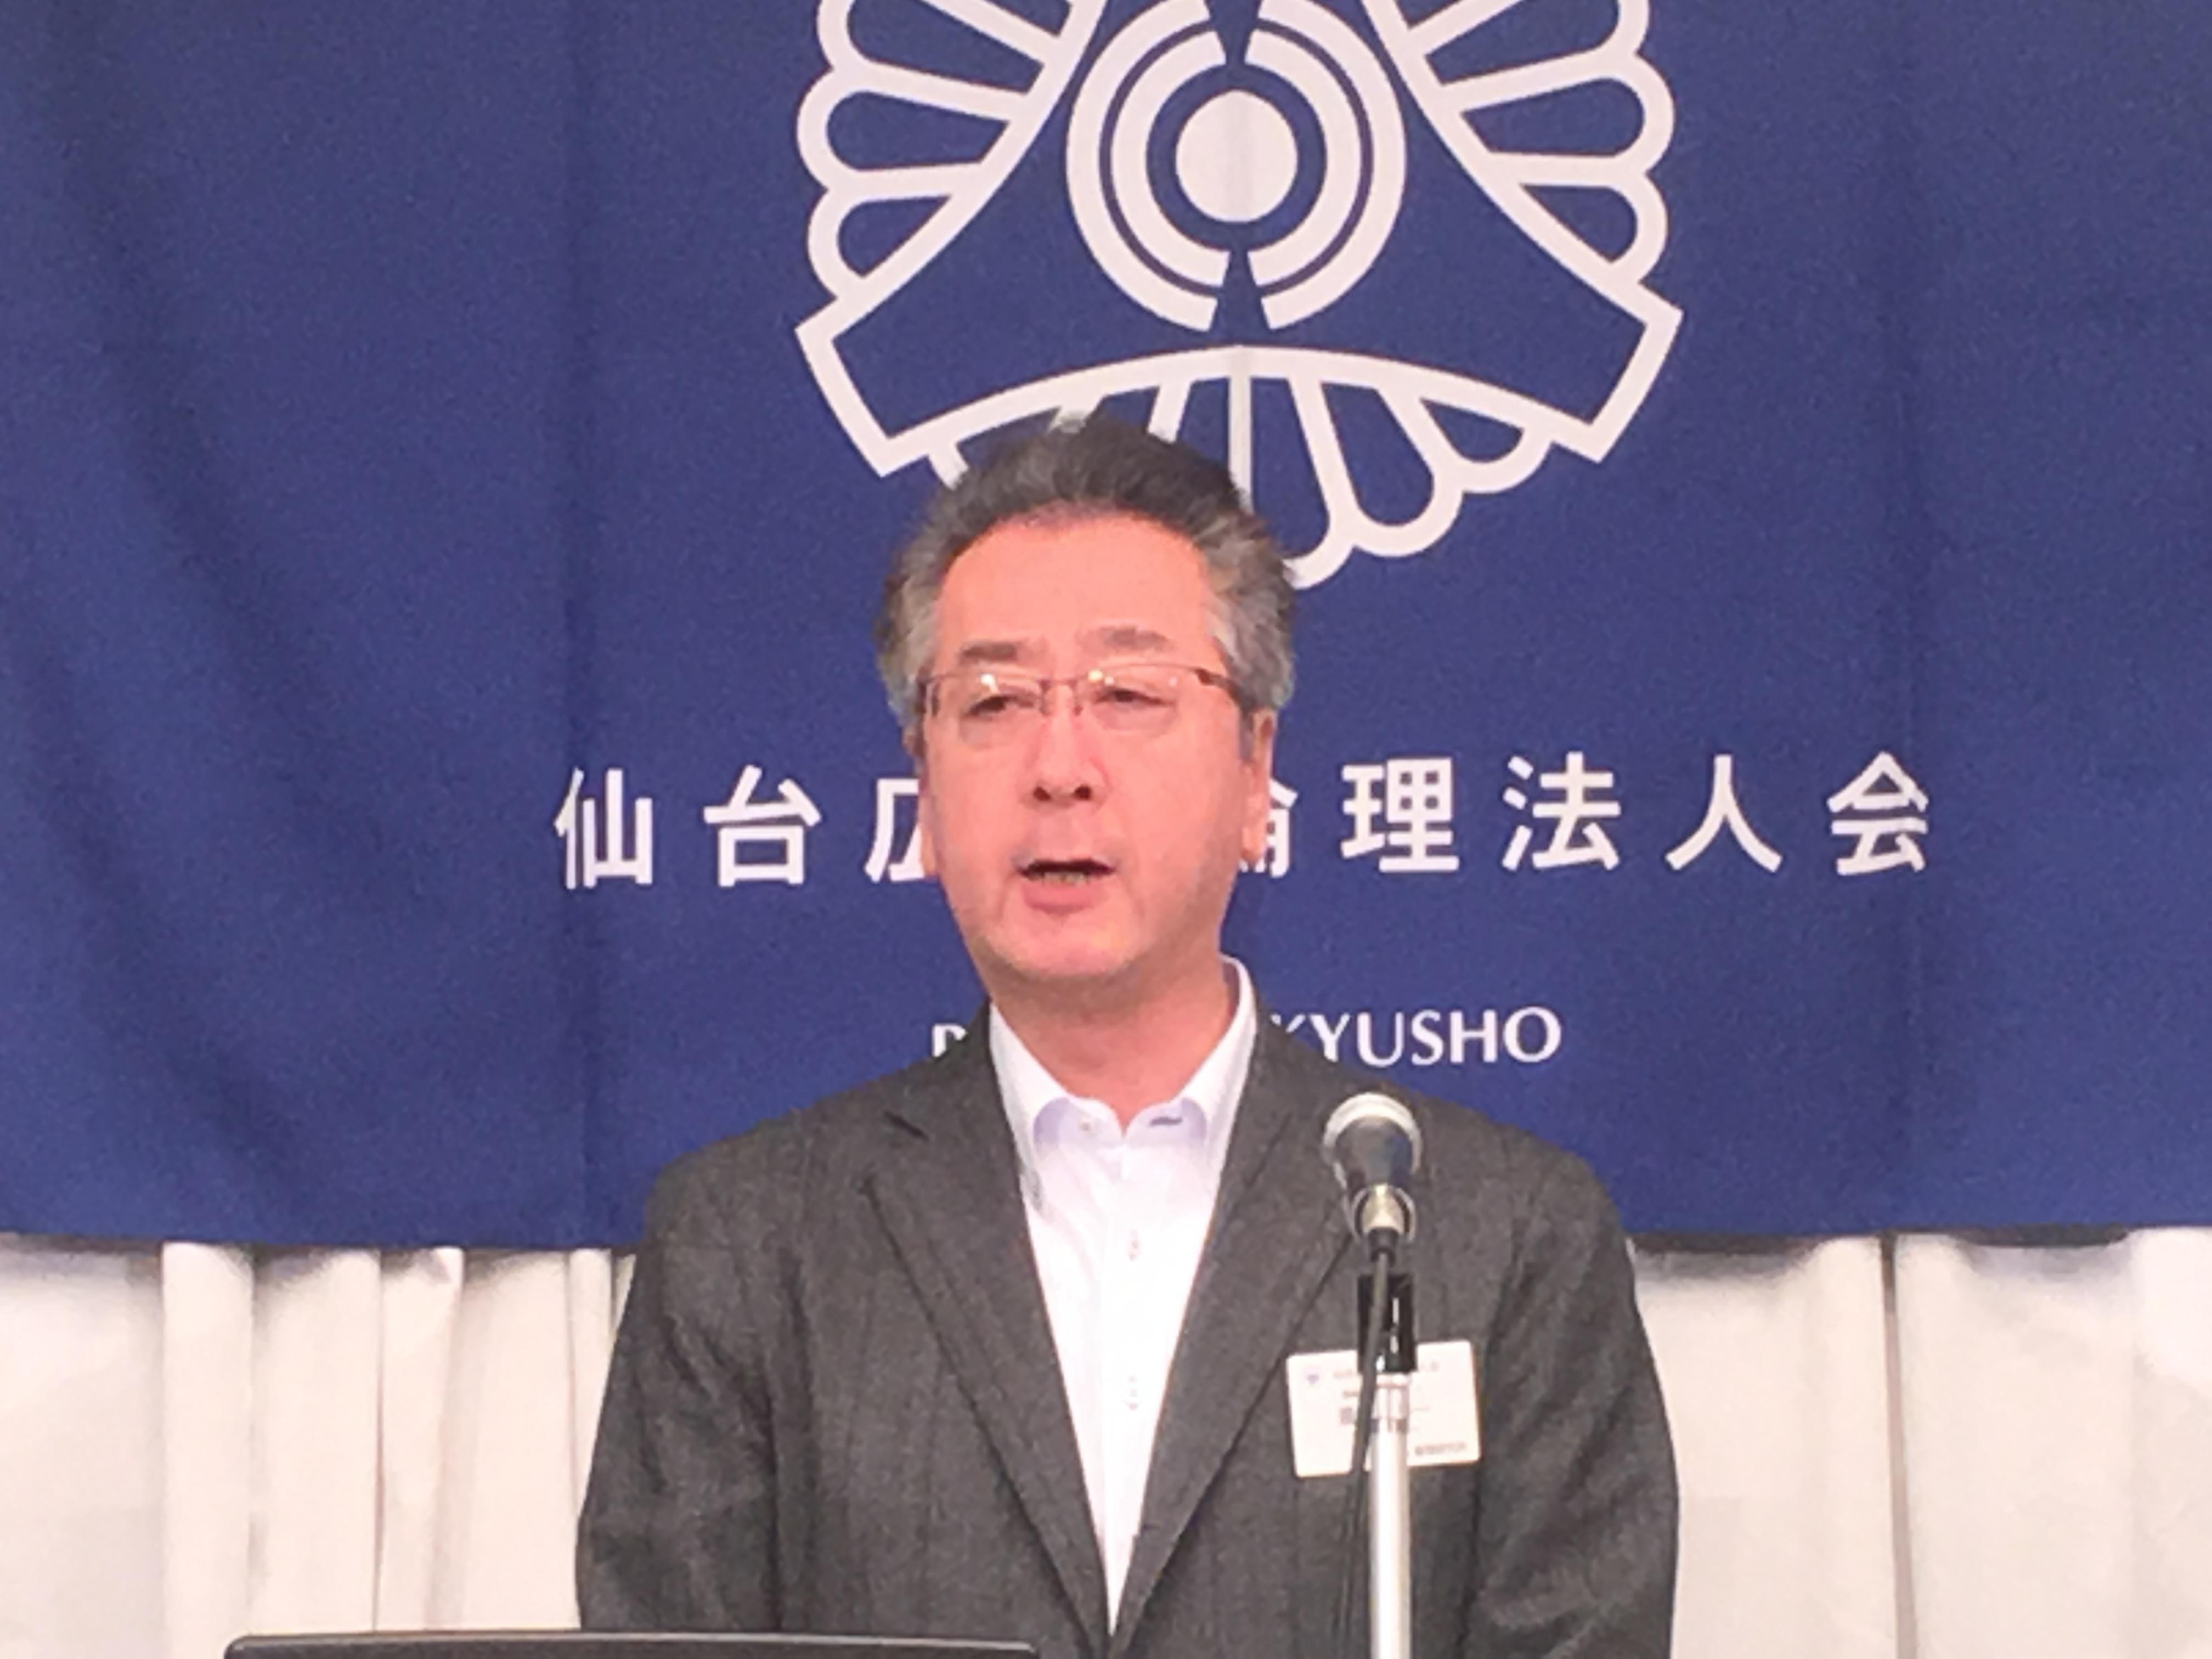 斎藤宗一さん 新入会員 名札授与式